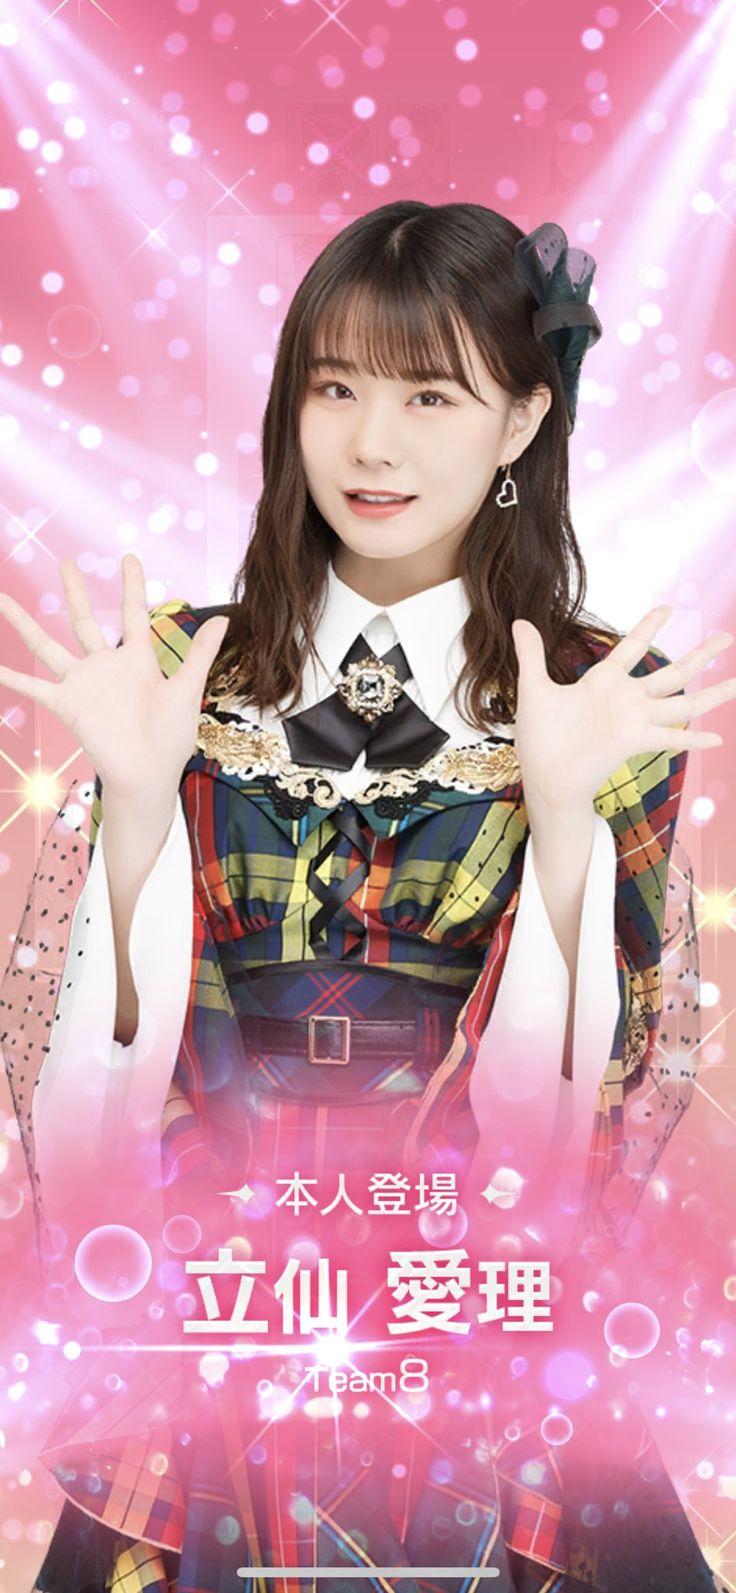 Ghim của ダンジョンズ&アイドルズ trên akb48 trong 2020